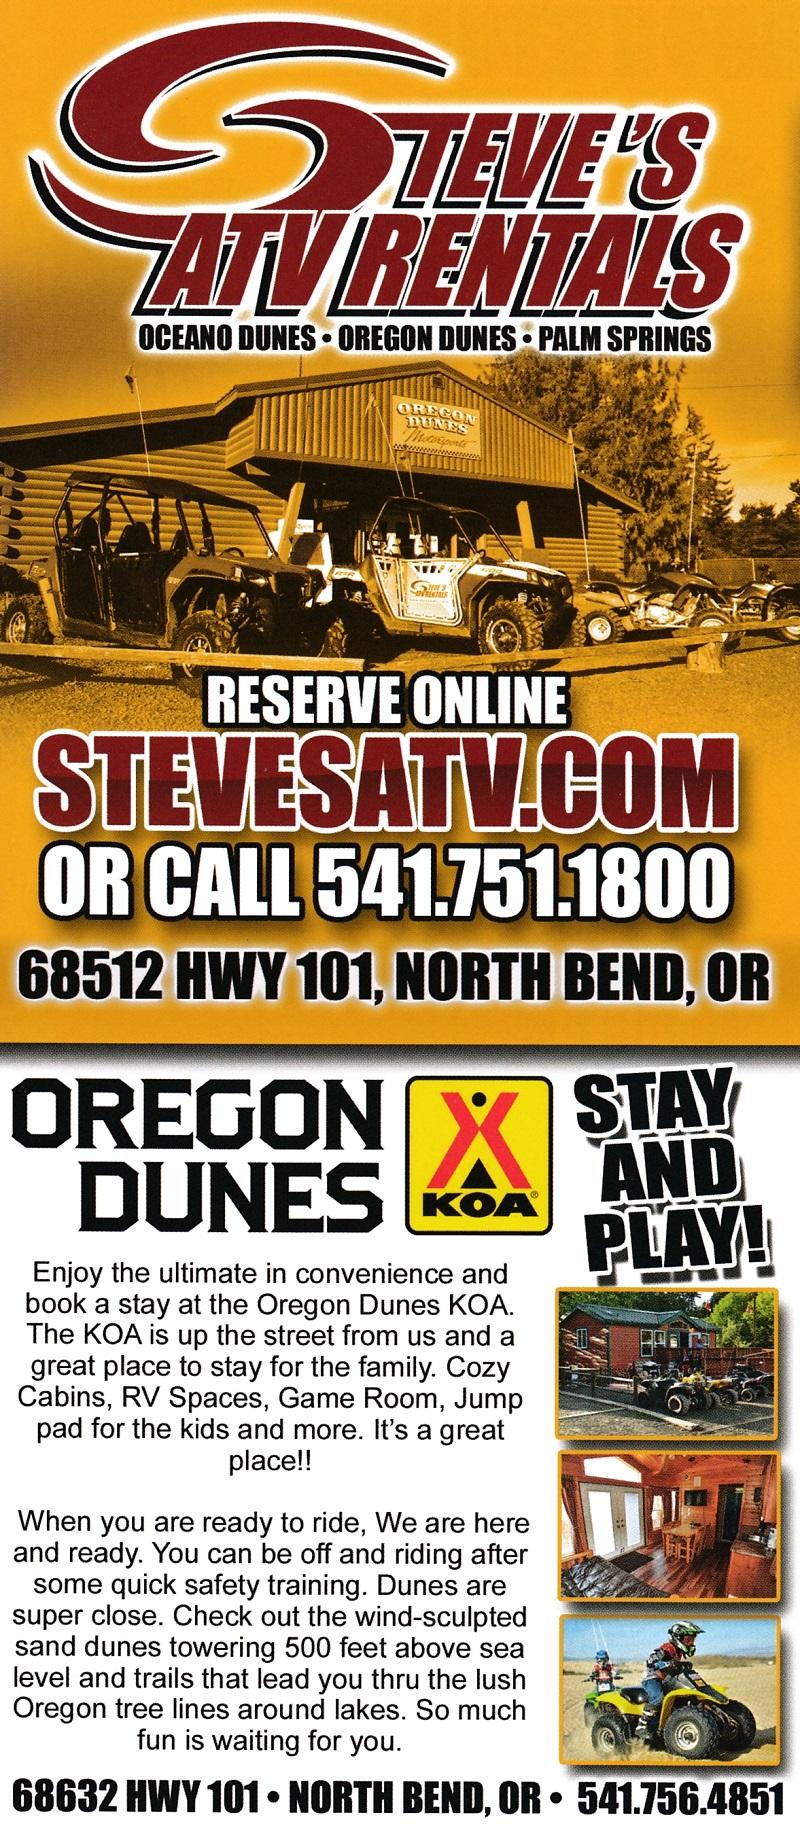 Steve's ATV - Oregon Coast brochure thumbnail